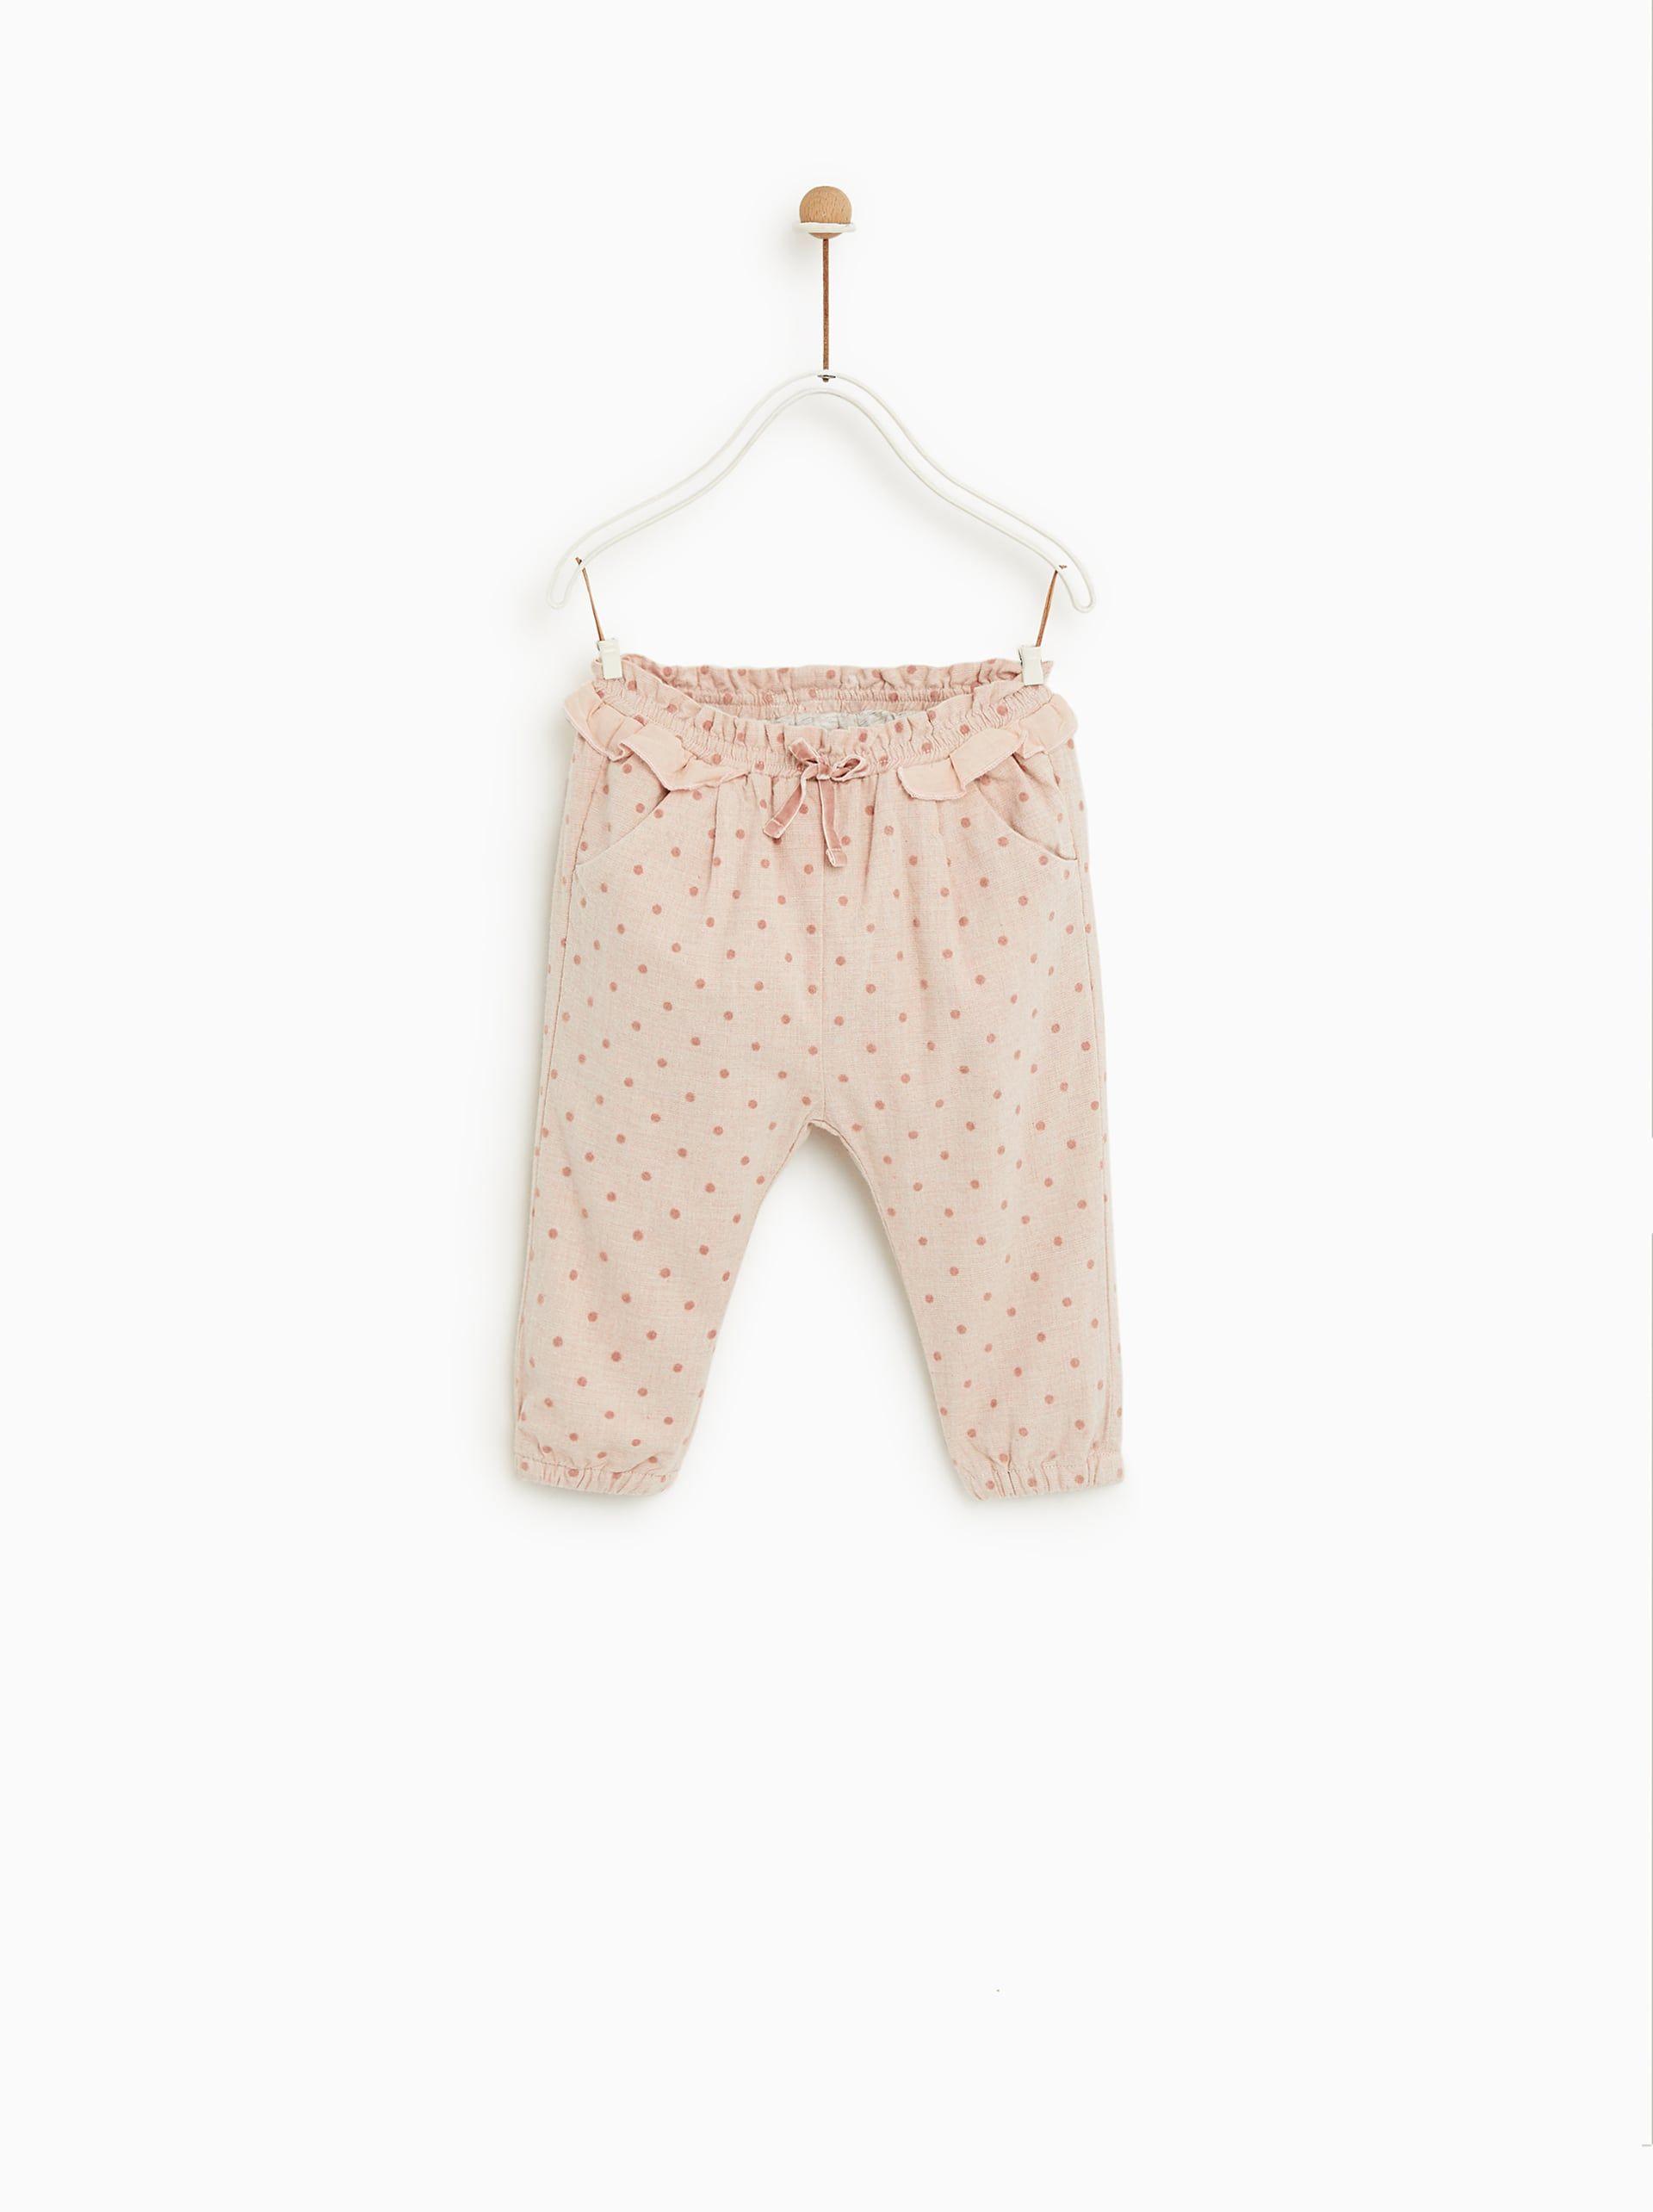 c5b2ef38 Image 1 of POLKA DOT TROUSERS from Zara Baby Kids Clothes, Polka Dot Pants,